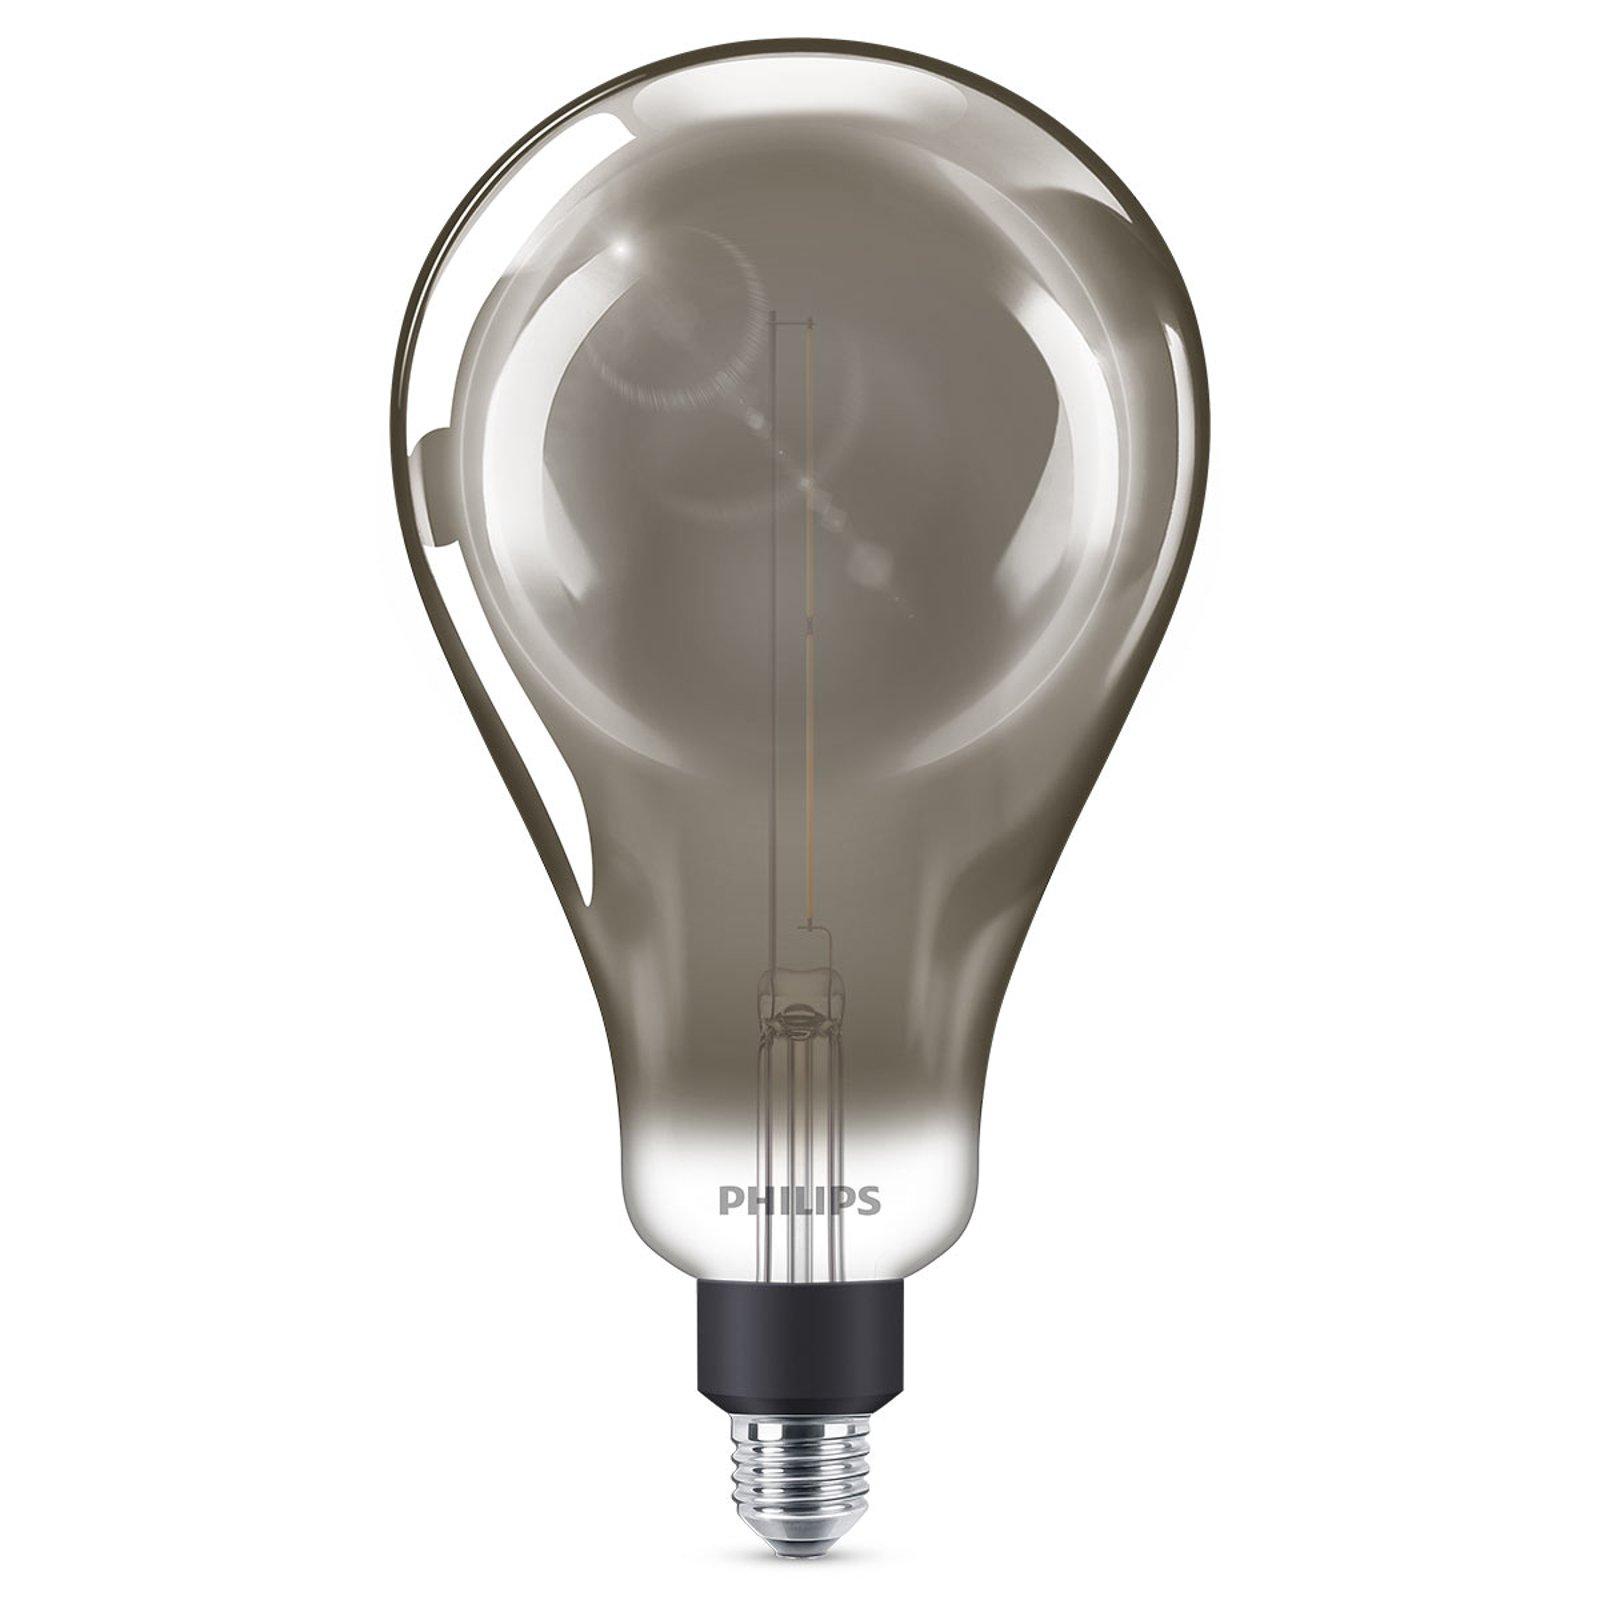 Philips E27 Giant LED-pære 6,5W dimbar smoky